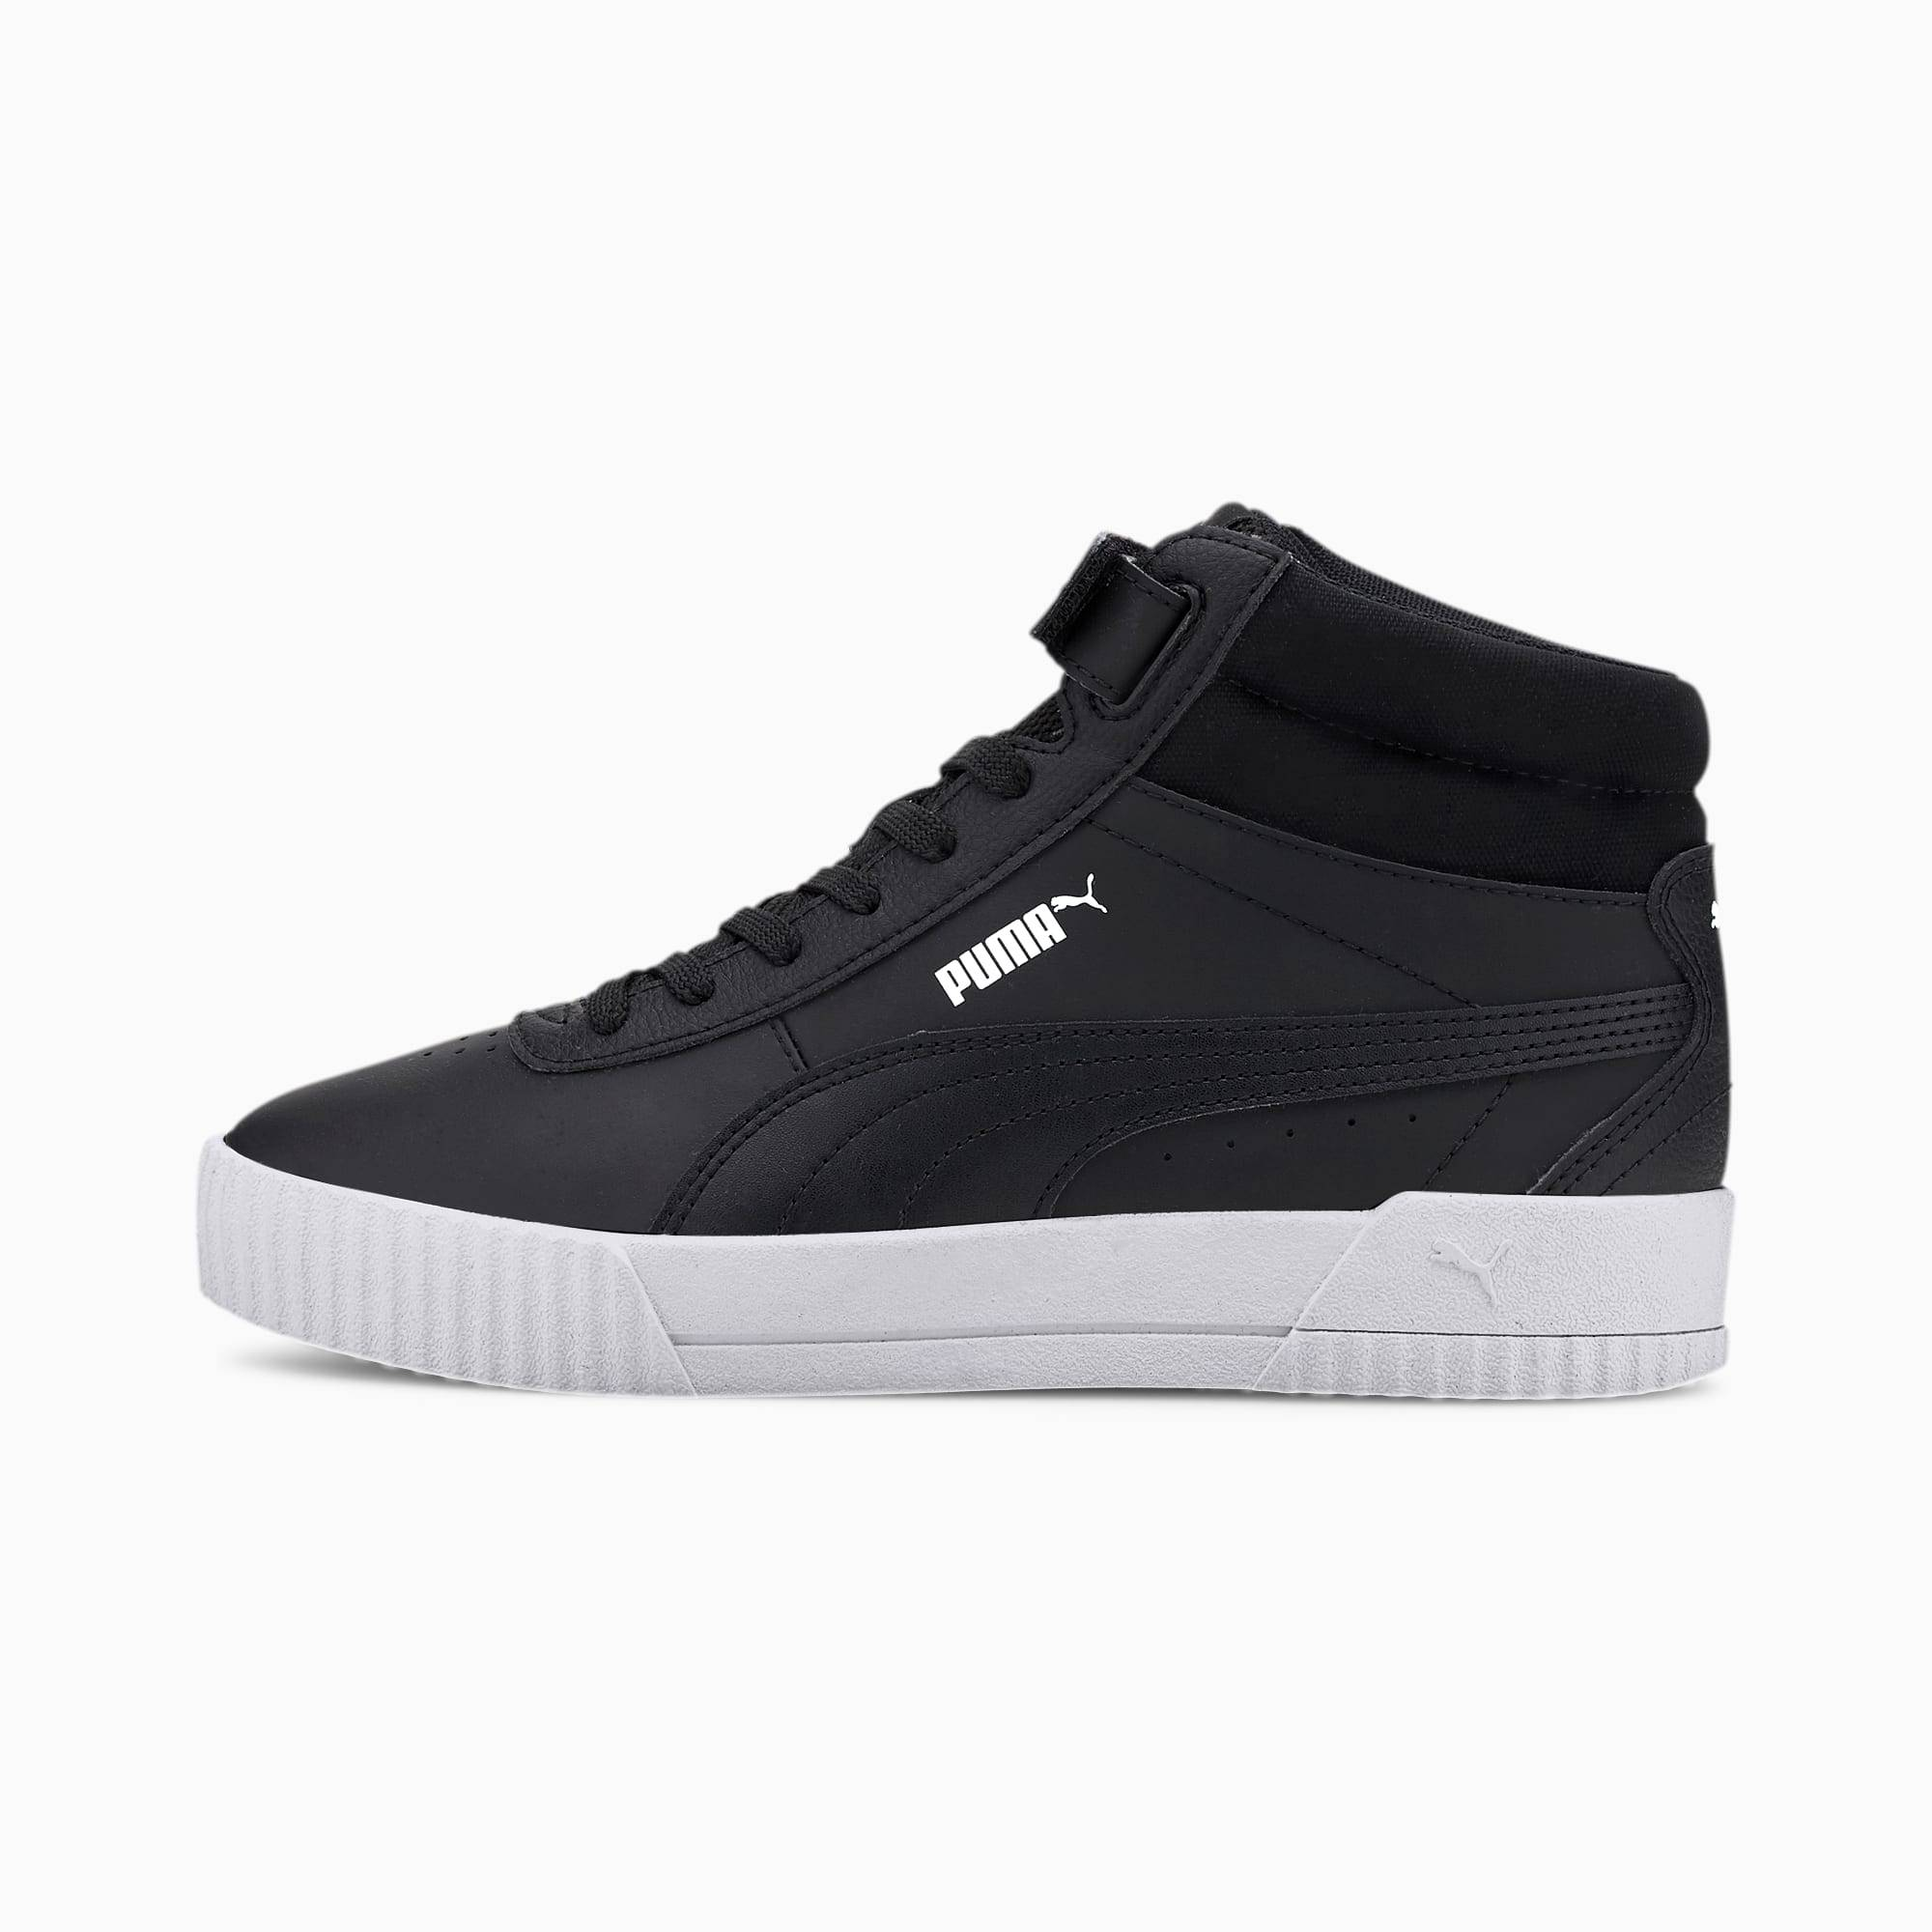 PUMA Chaussure Basket montante Carina femme, Noir, Taille 41, Chaussures